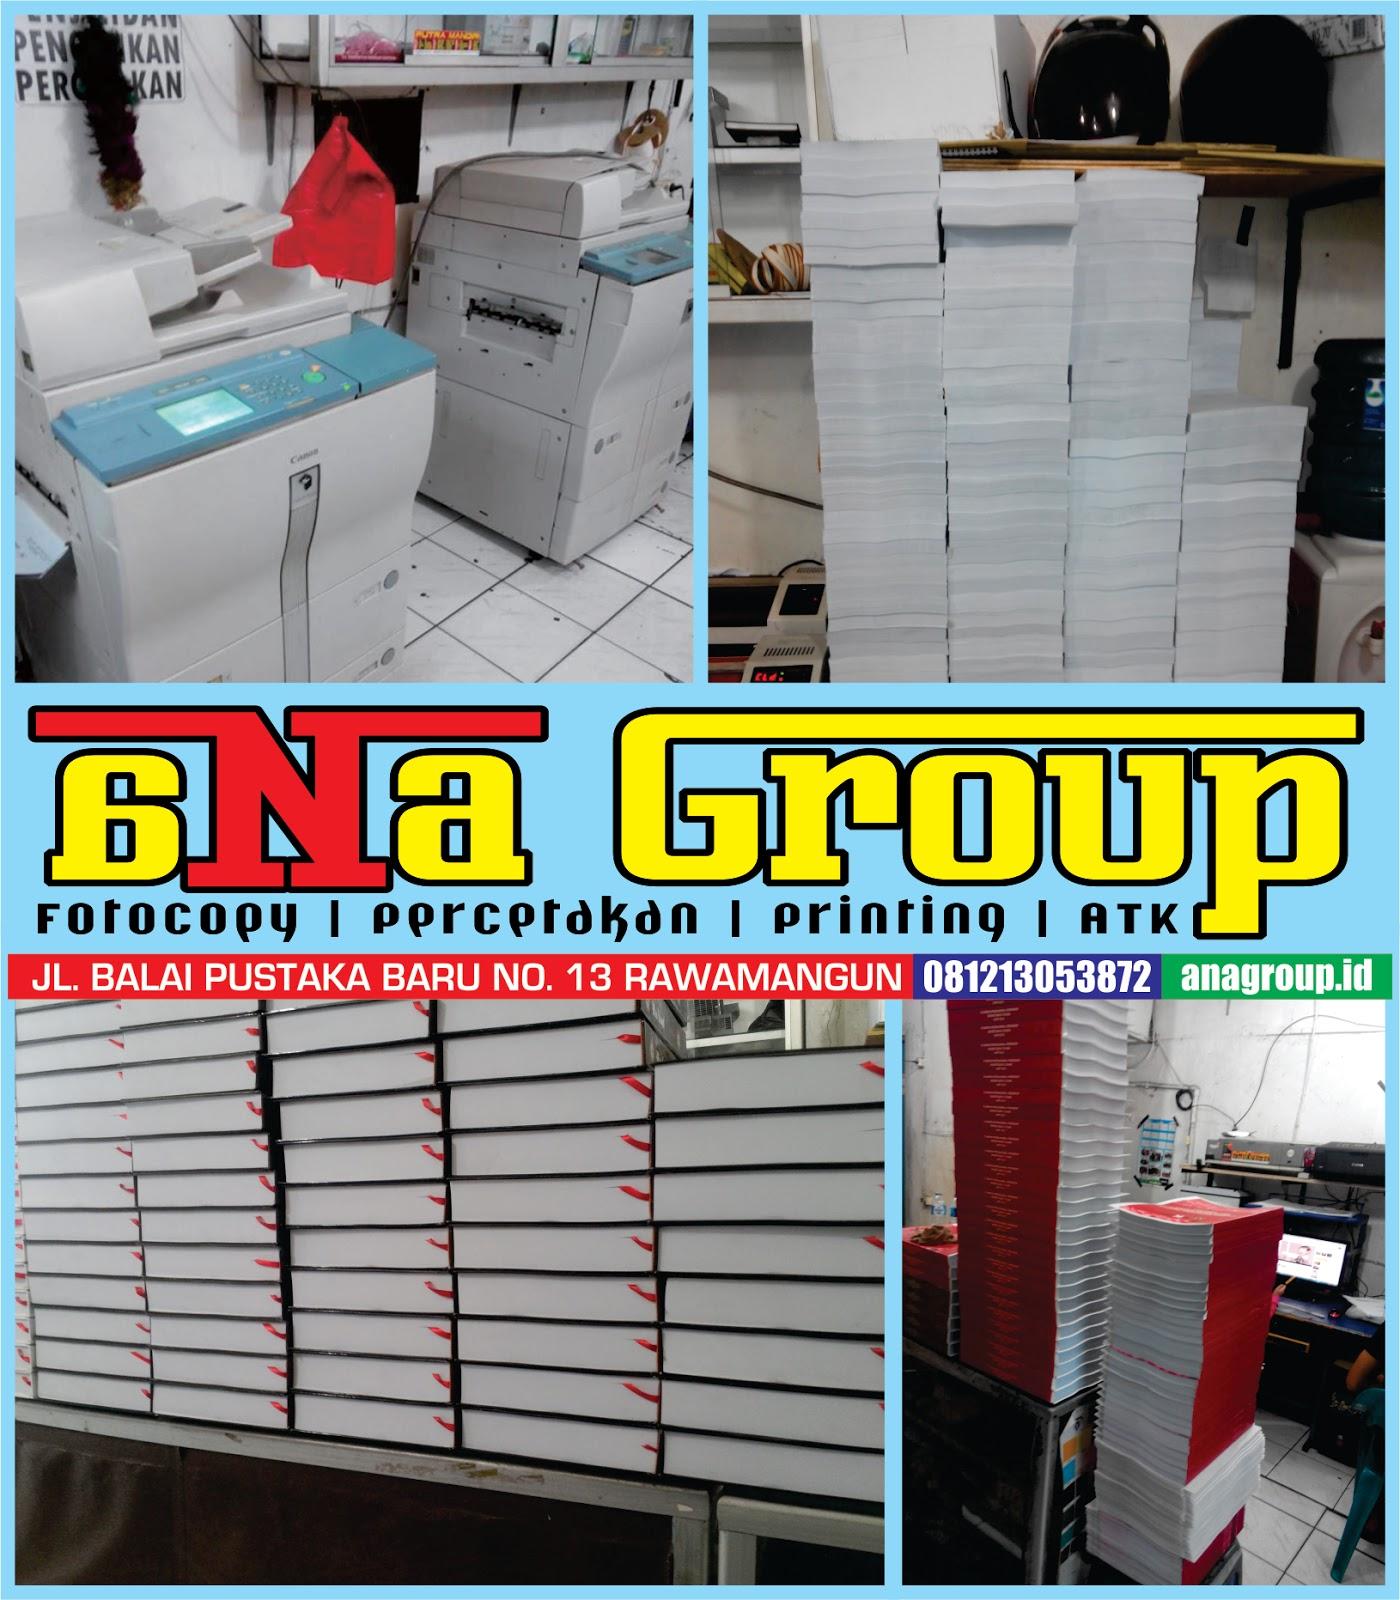 Fotocopy Penjilidan anagroup.id